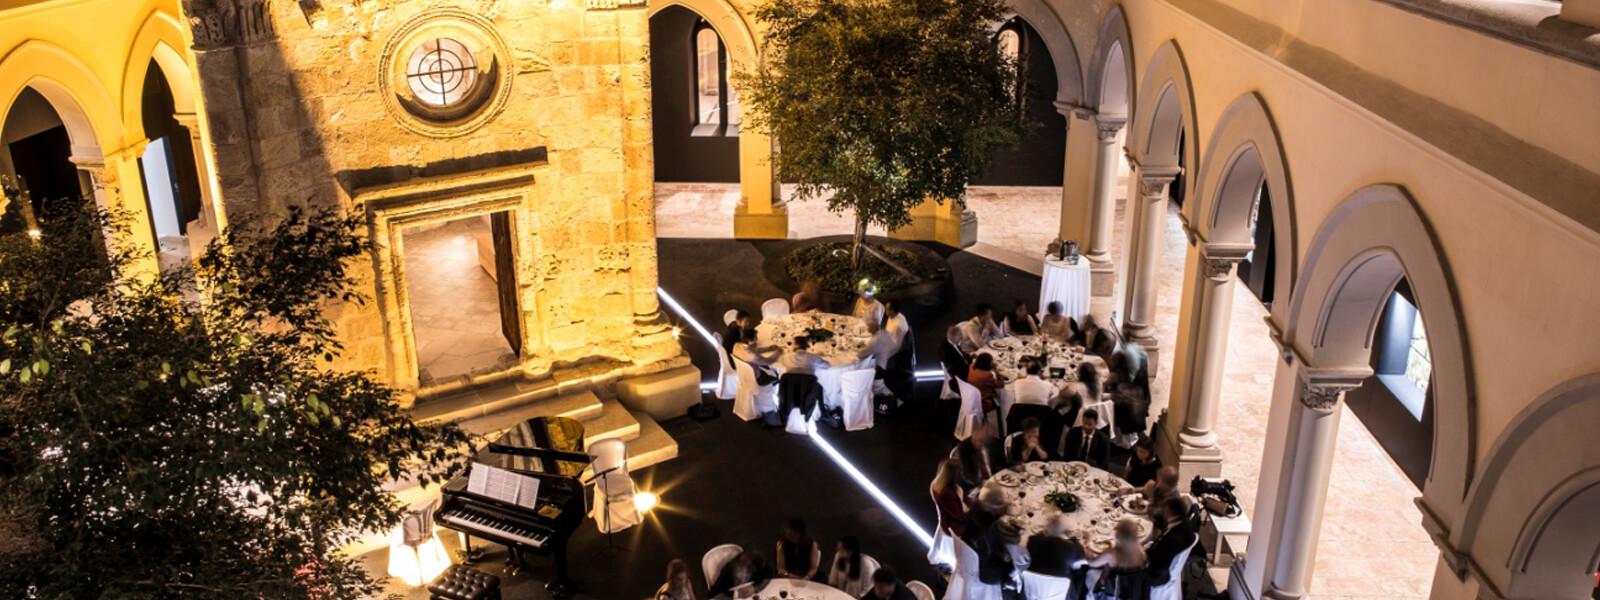 El Seminari Tarragona